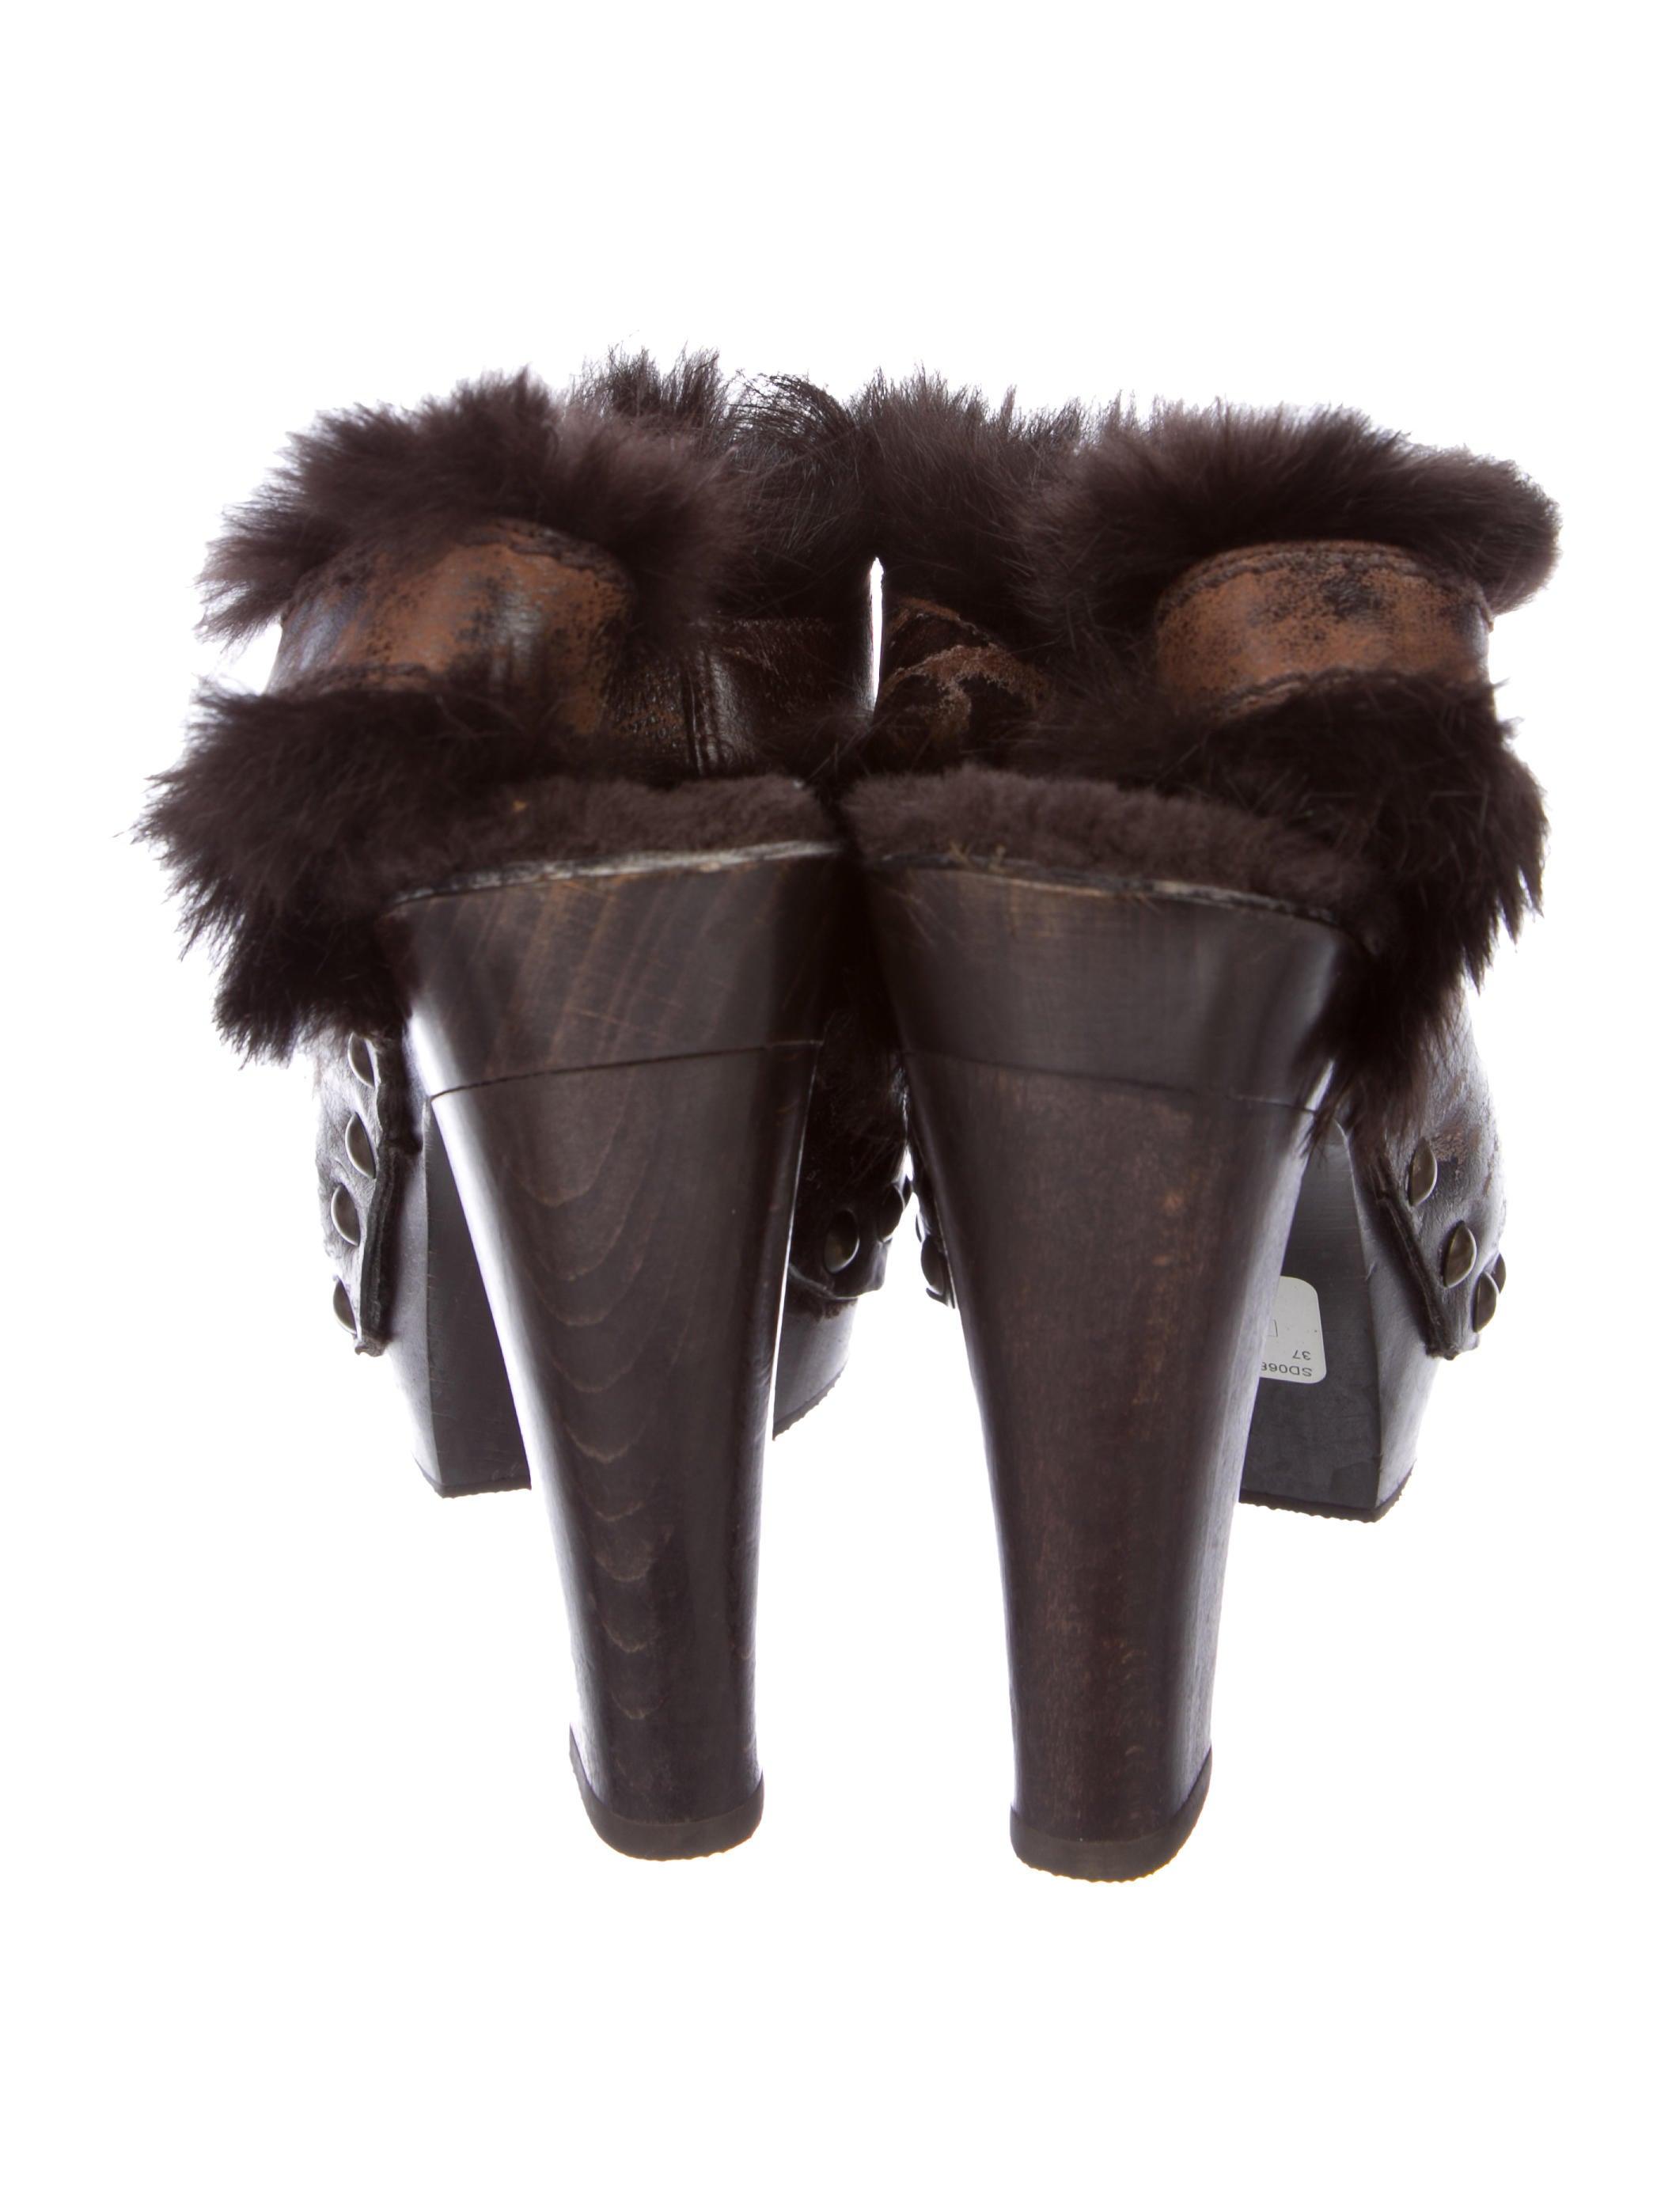 outlet websites marketable Henry Beguelin Fur-Trimmed Leather Booties wzKdaWjC98